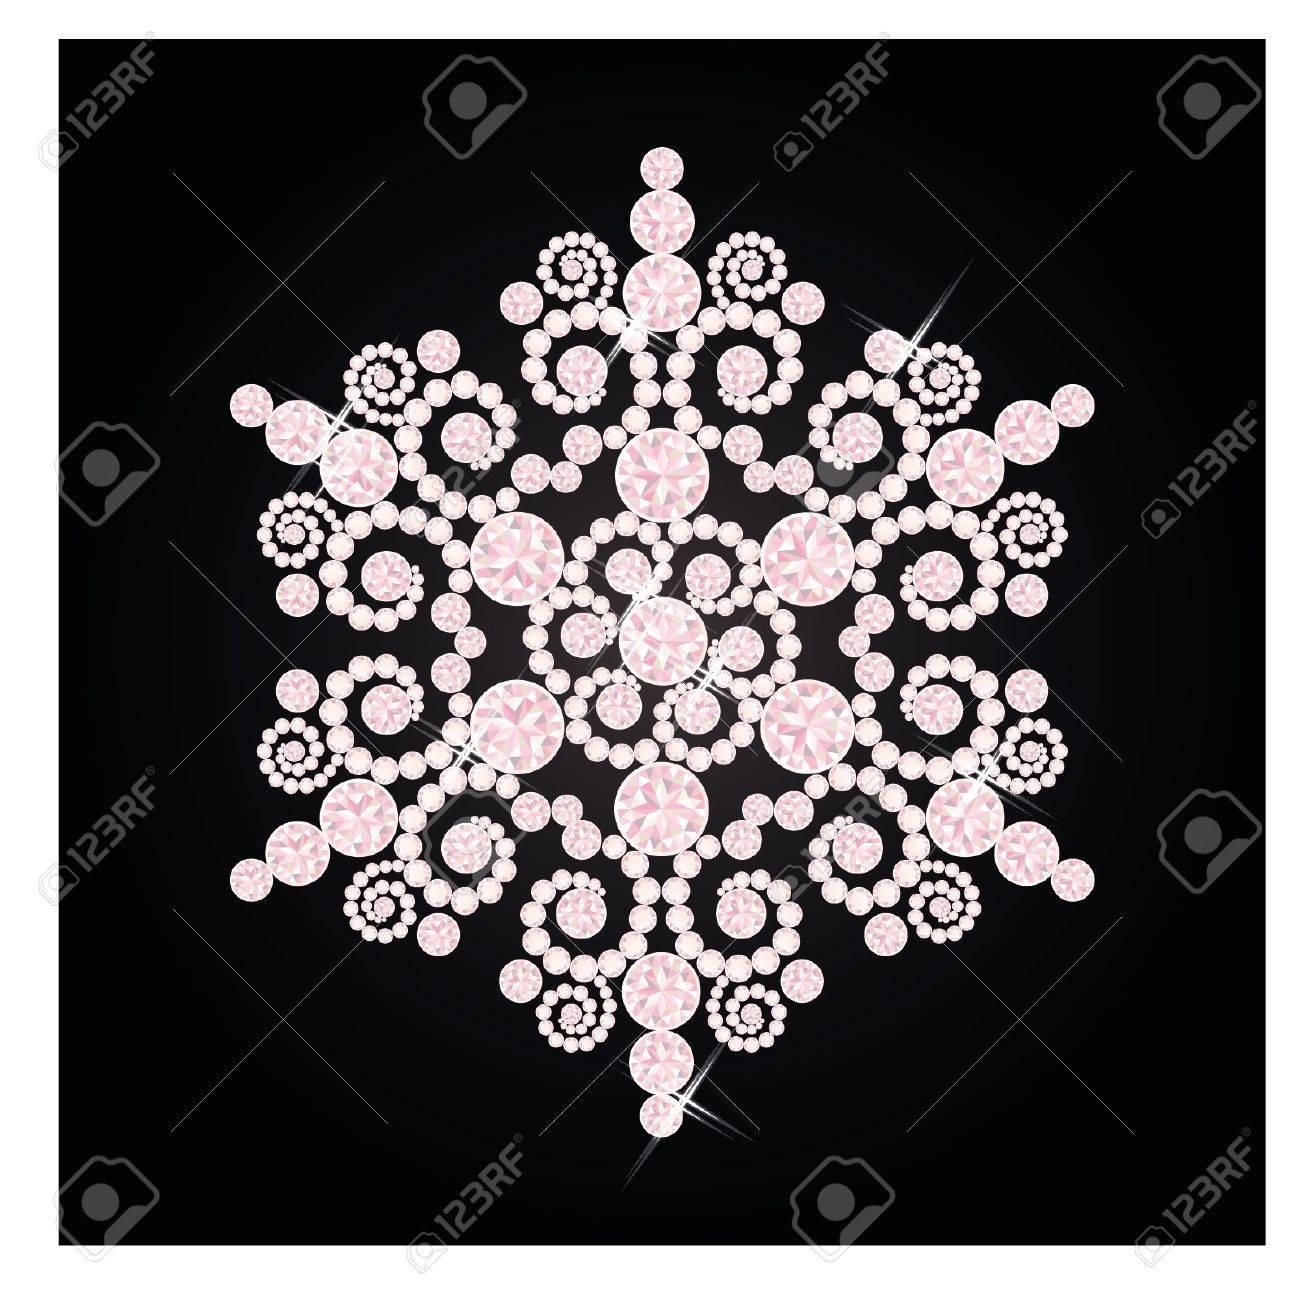 Diamond snowflake, vector illustration Stock Vector - 16693001